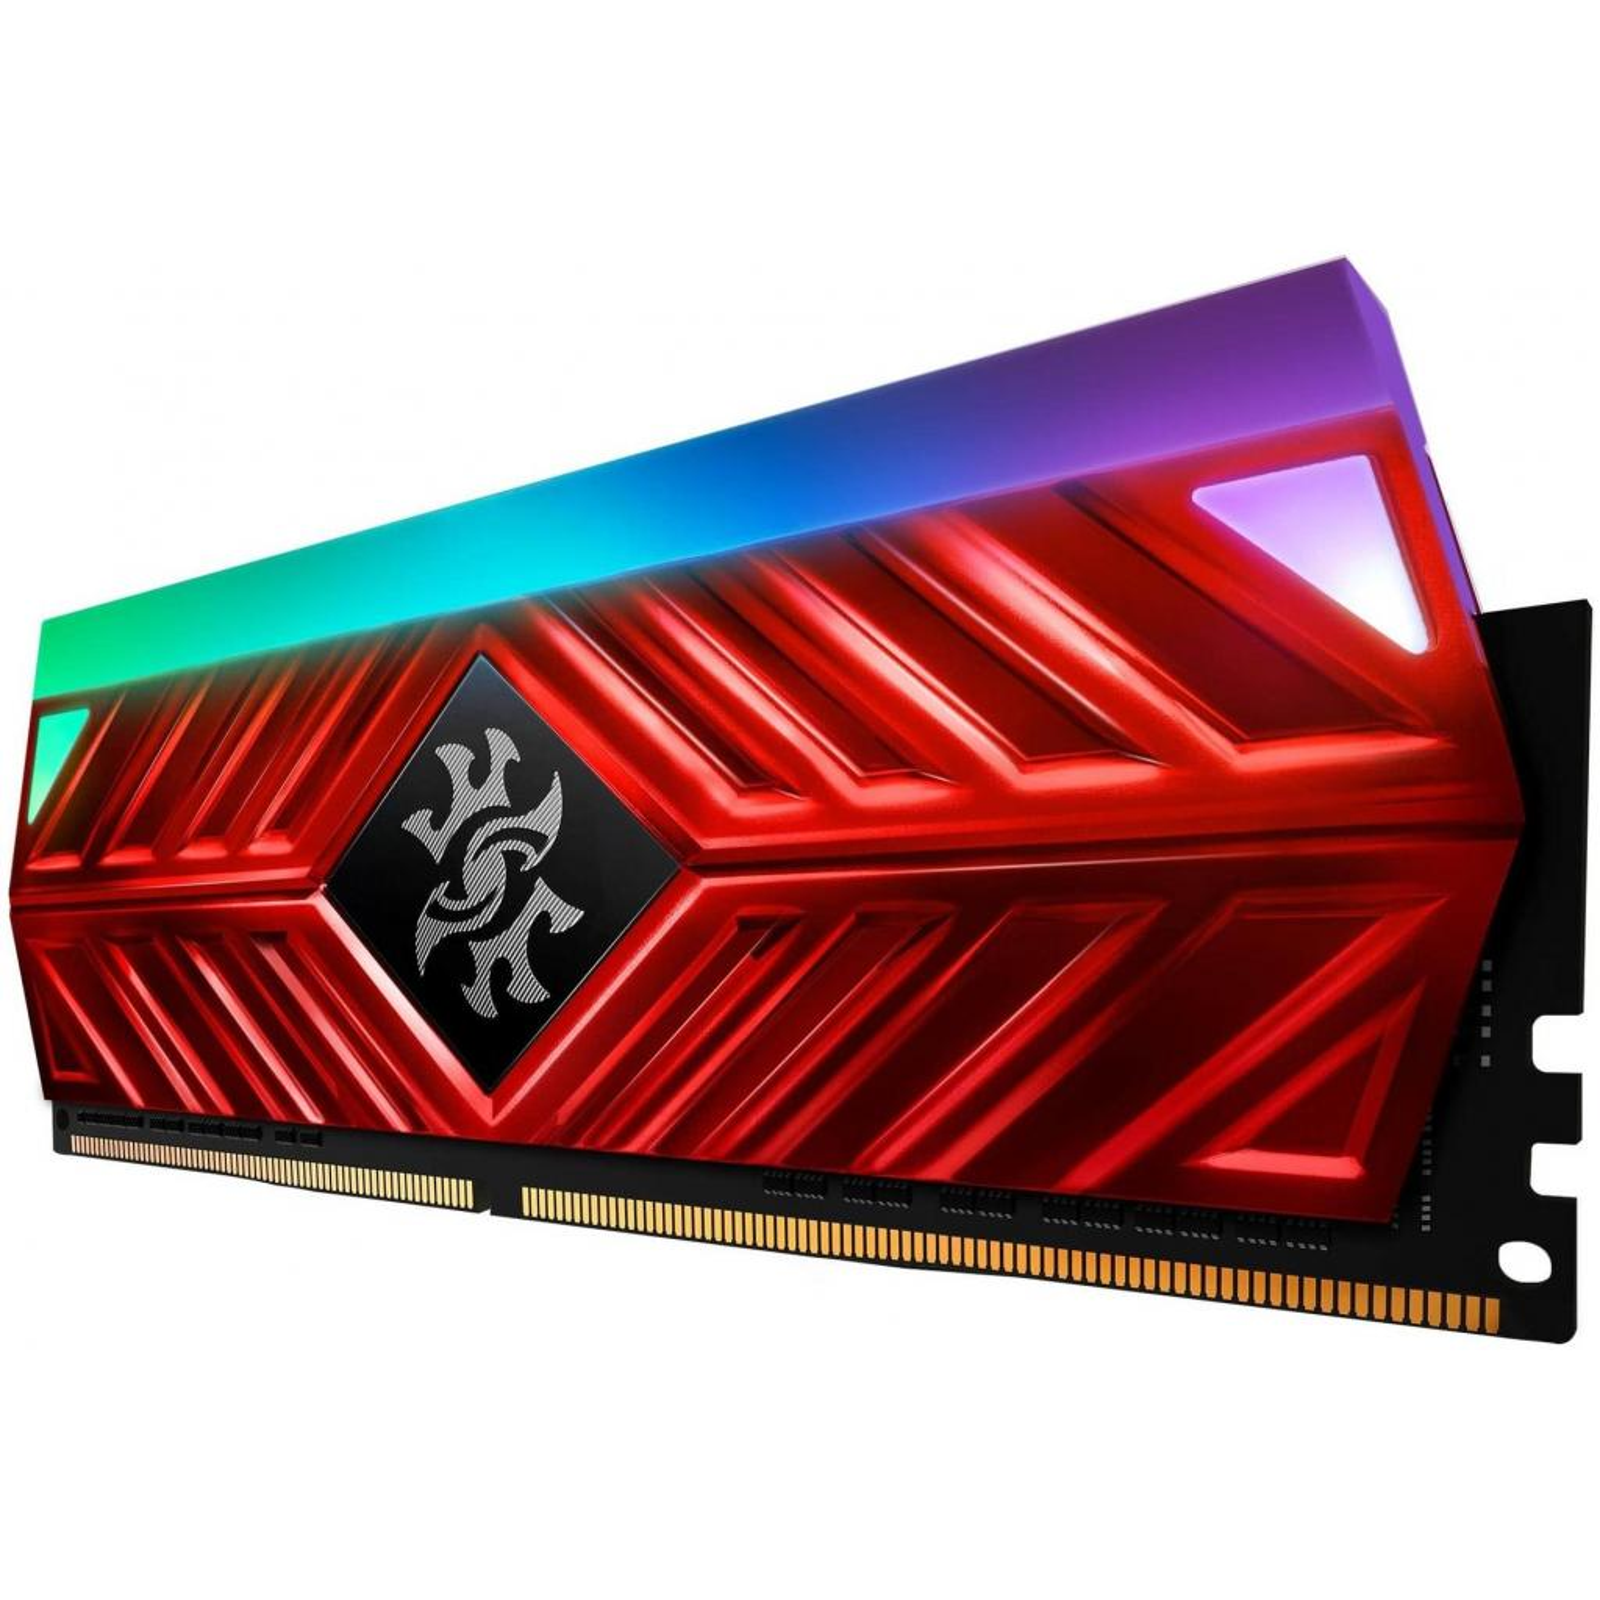 Модуль памяти для компьютера DDR4 8GB 3600 MHz XPG Spectrix D41 Red ADATA (AX4U360038G17-SR41) изображение 3